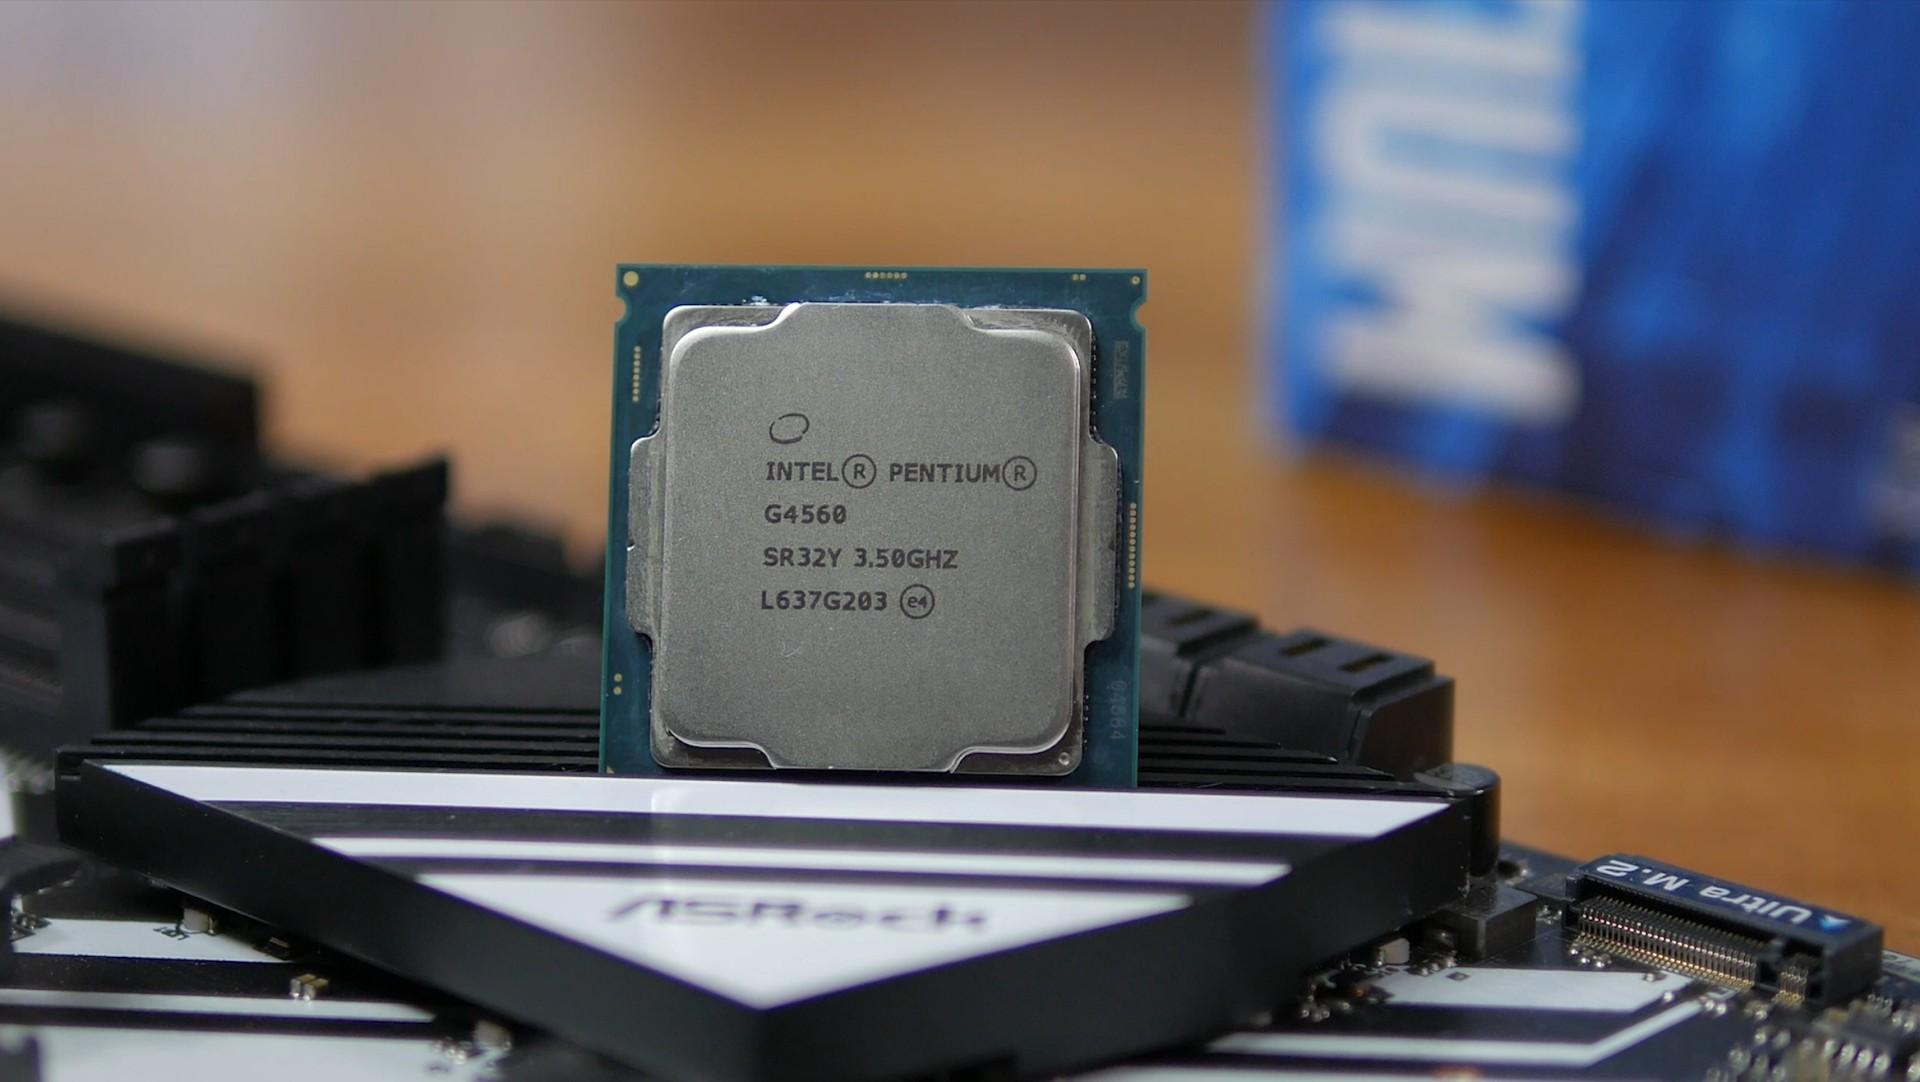 Lenovo Xiaoxin 15 2020 Laptop With 10th Gen Core i7 Processor AMD Ryzen 4800U 16GB Ram 512GB SSD